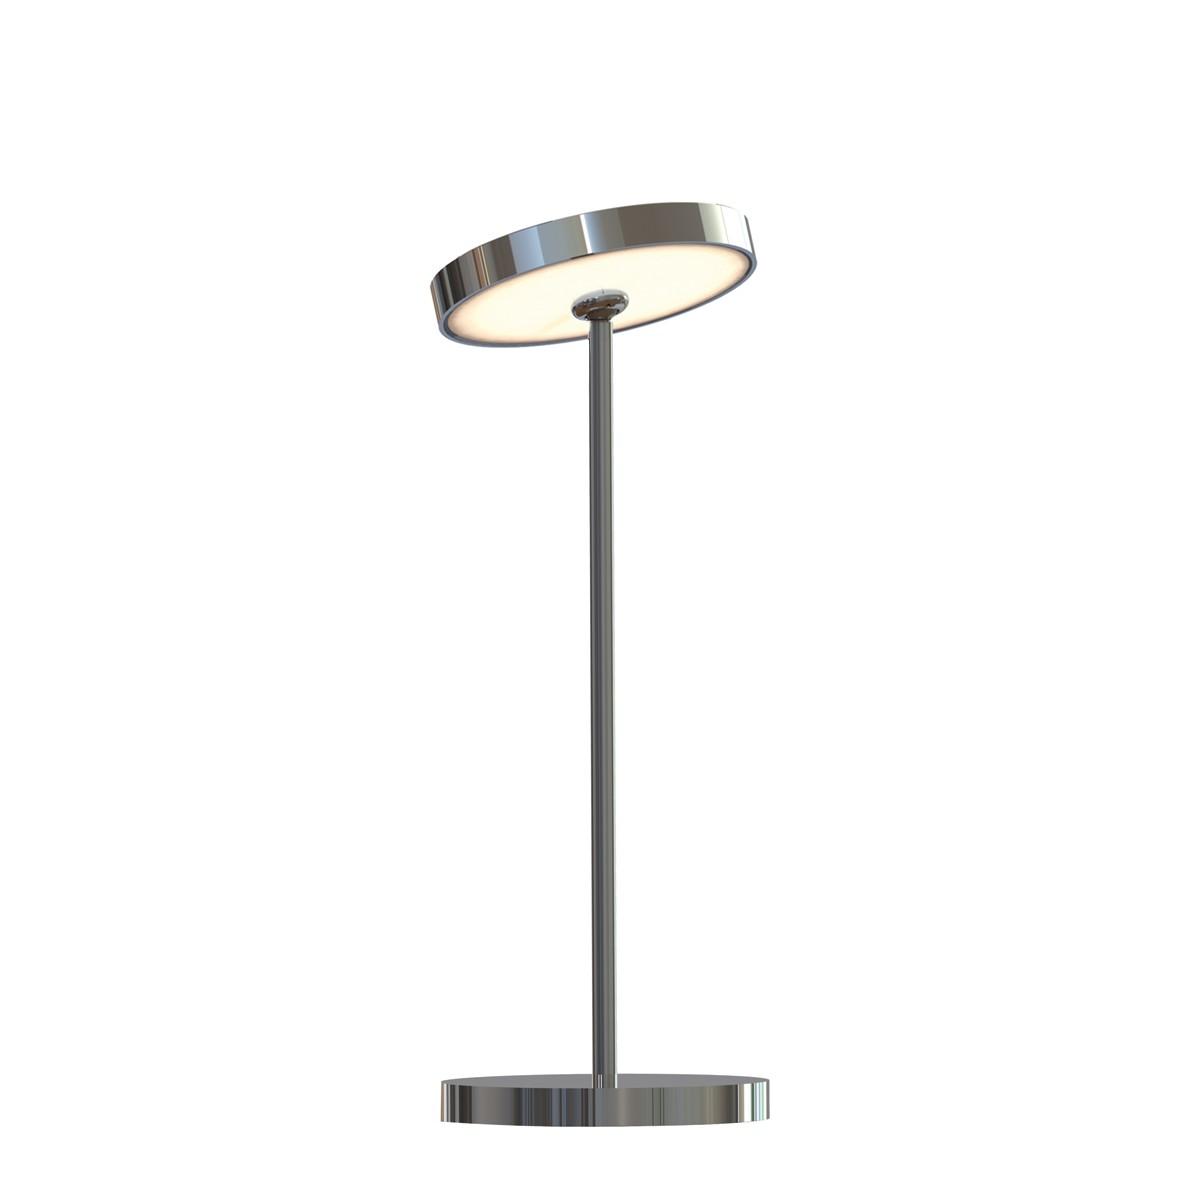 Top Light Sun Table Tischleuchte 30, Ø: 13 cm